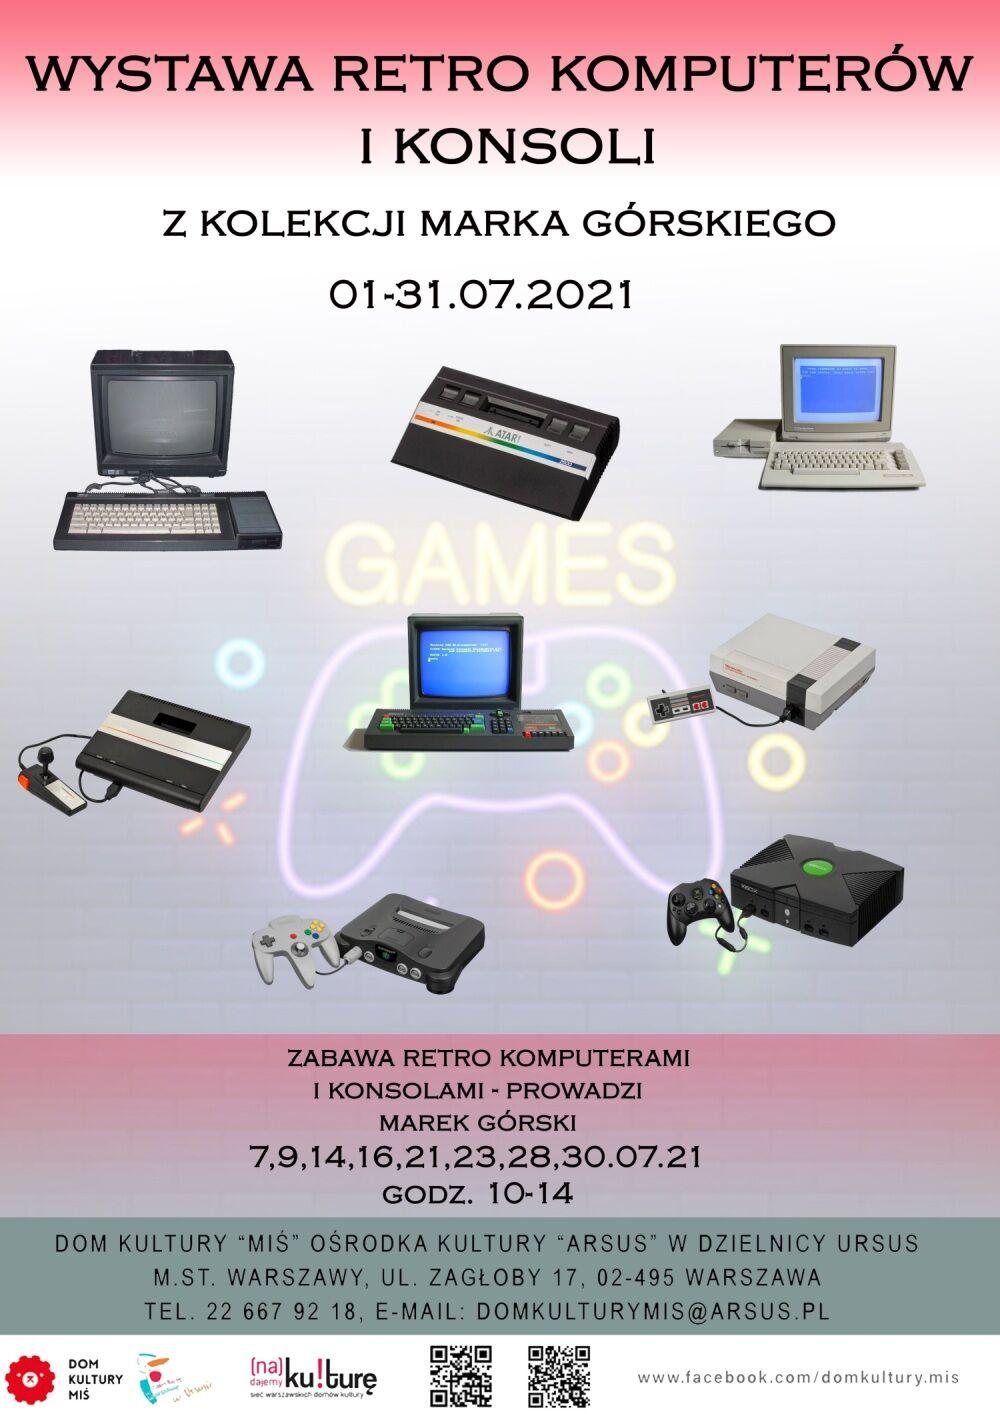 https://www.galerieallegro.pl/zdjecia/z1061/10614219/big/2.jpg?screen